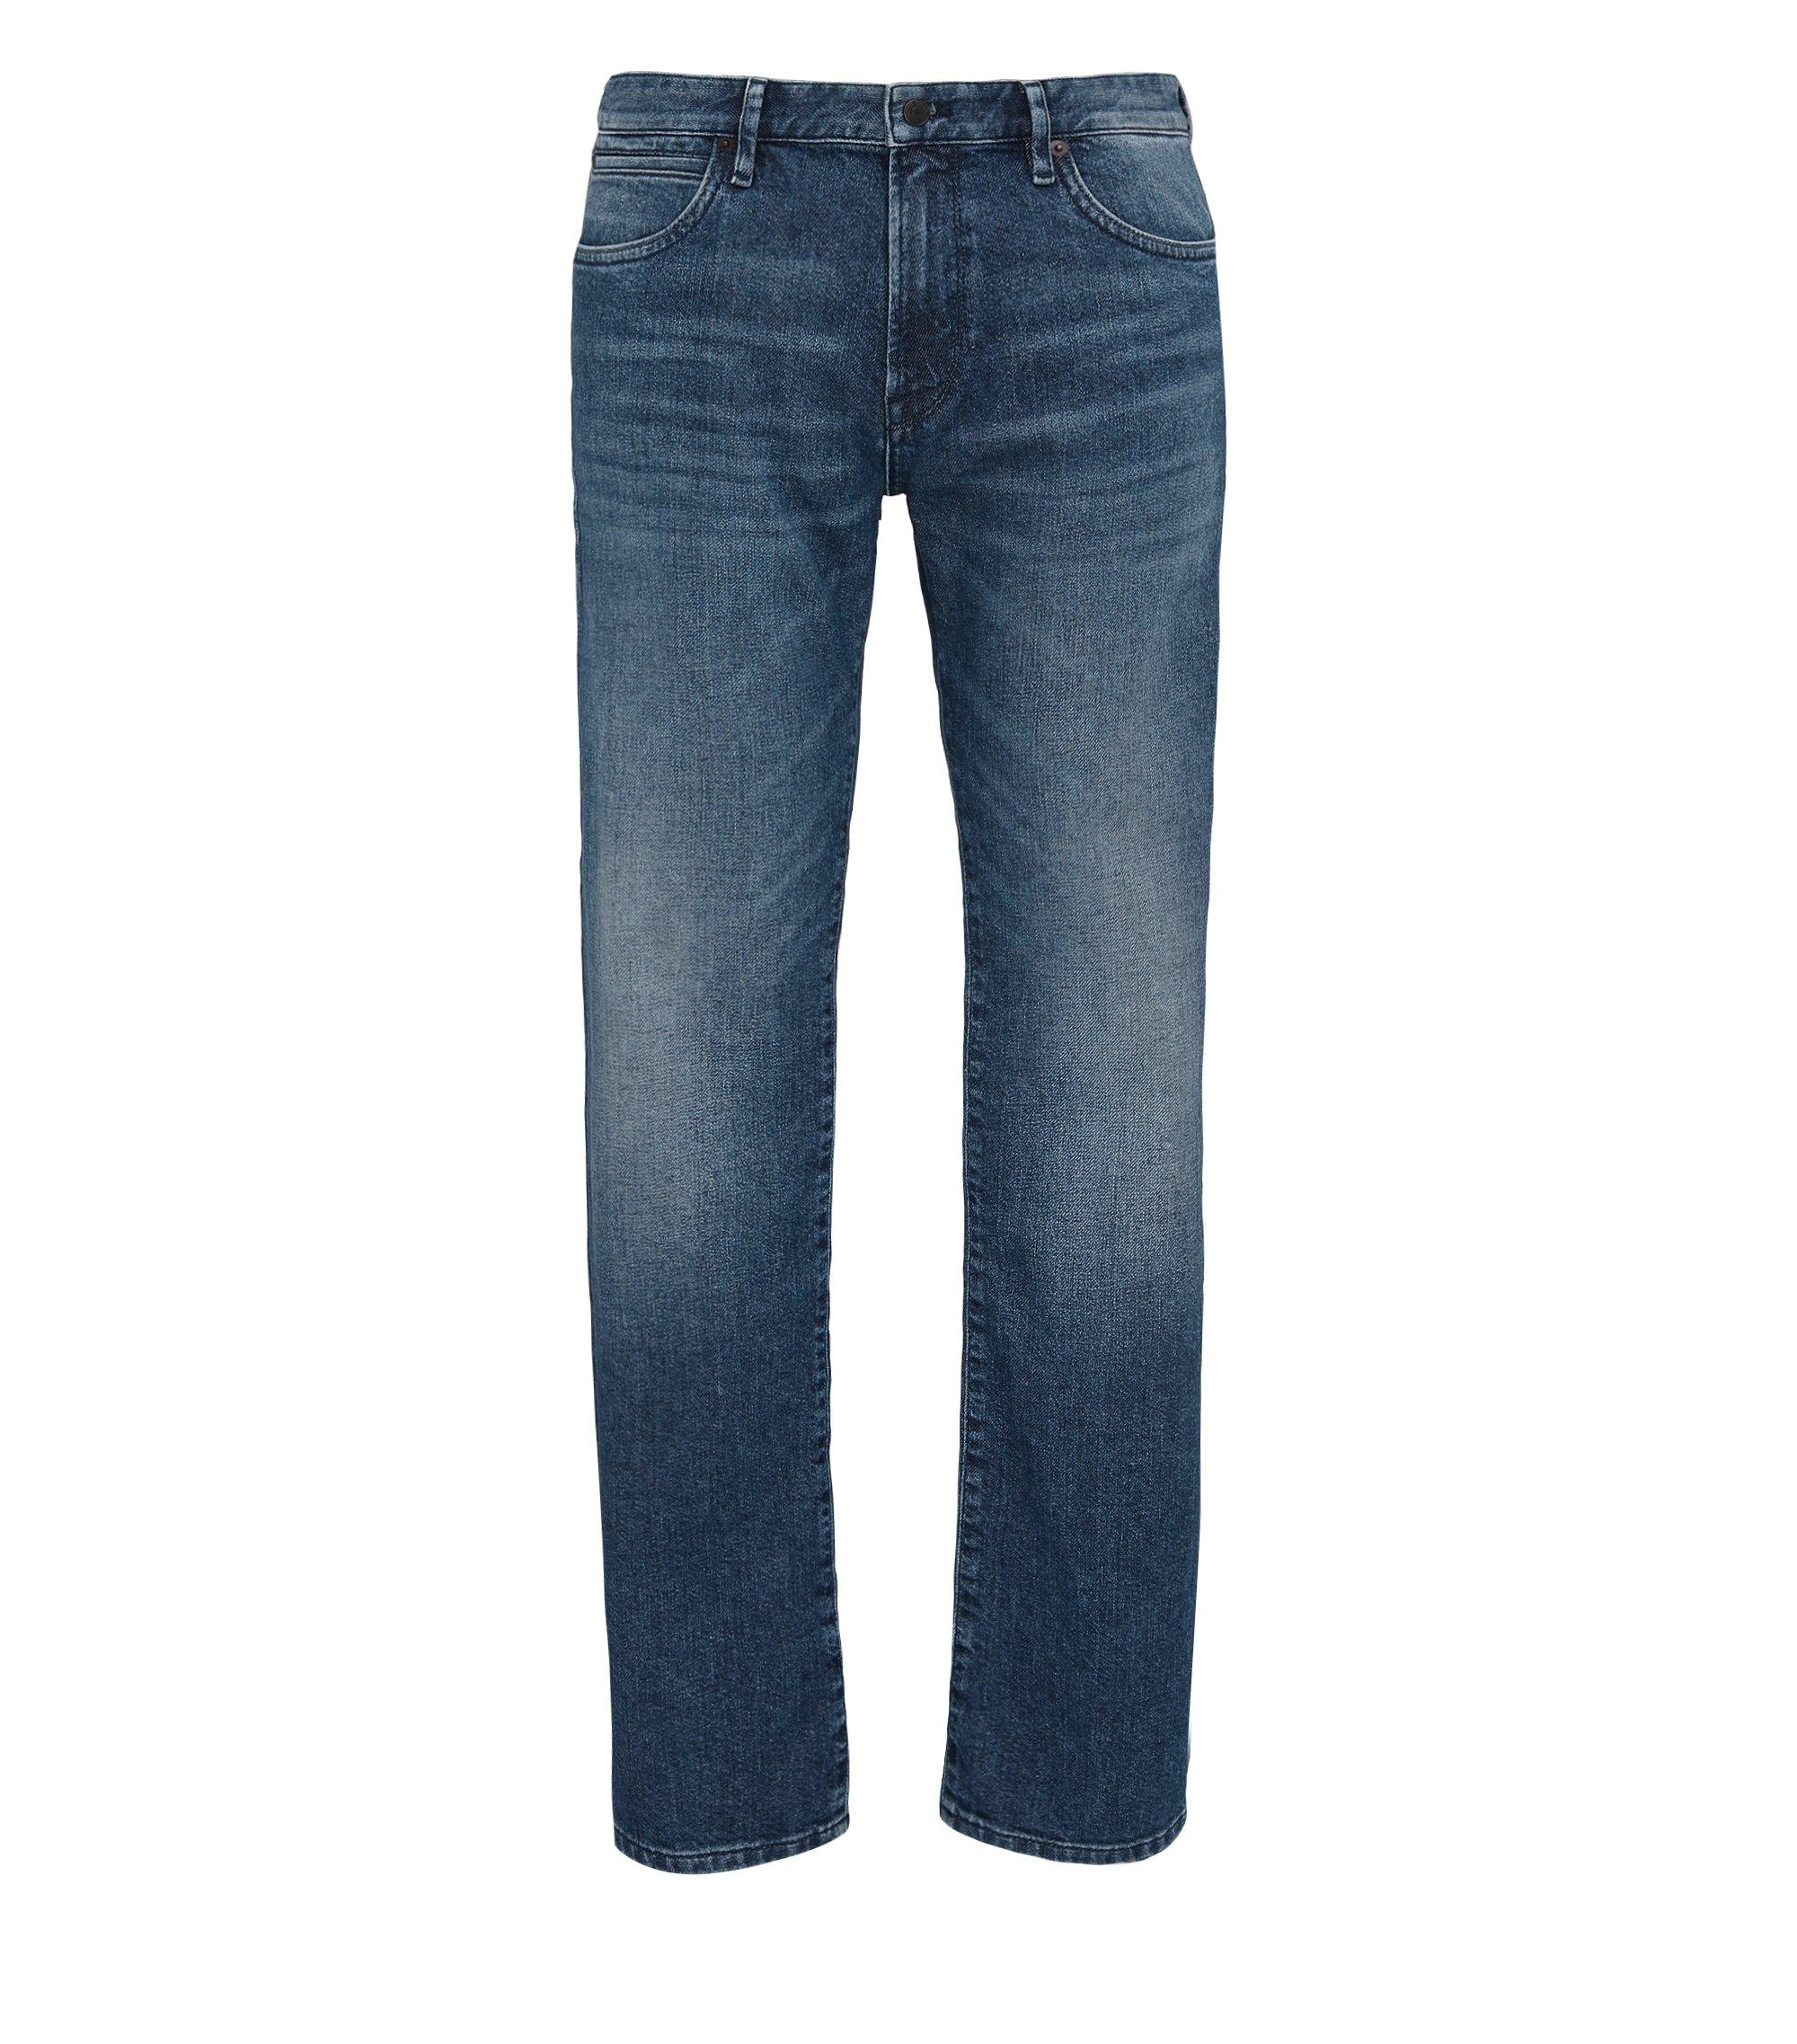 Regular-Fit Jeans aus mittelschwerem Baumwoll-Mix, Dunkelblau